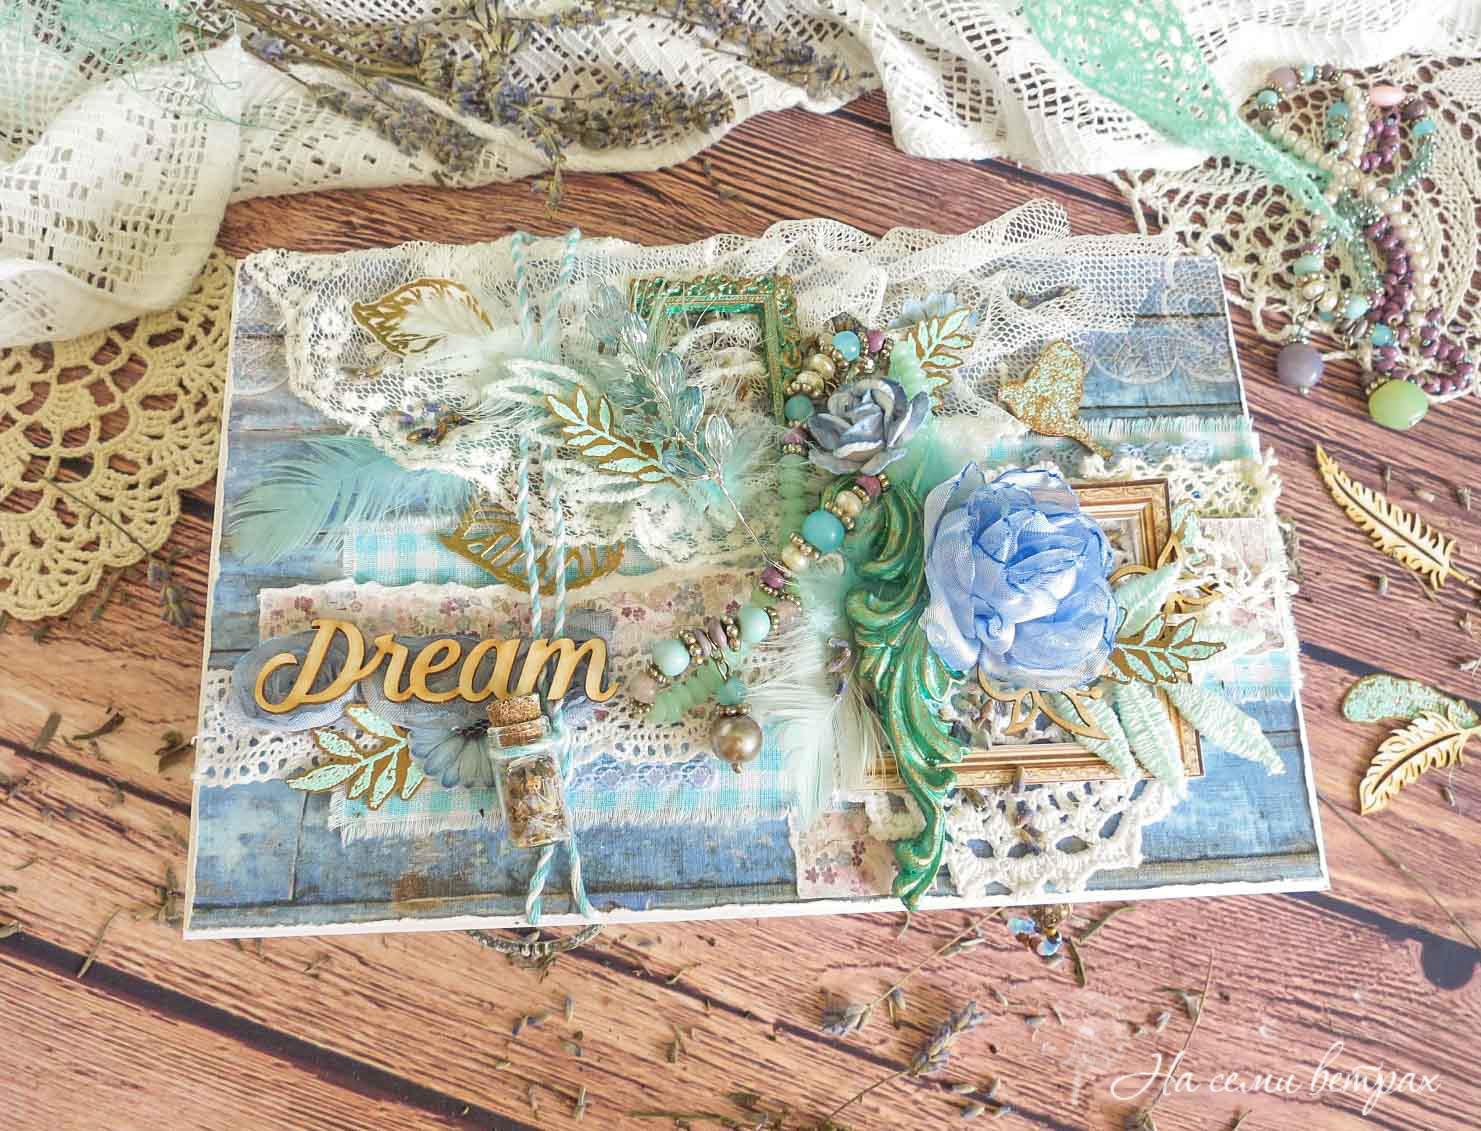 Юг Франции, лаванда, скрапбукинг, коробочка для подарка, lavender, South France, papercrafting, scrapbooking, box for gift, цветы ручной работы, цветы из ткани